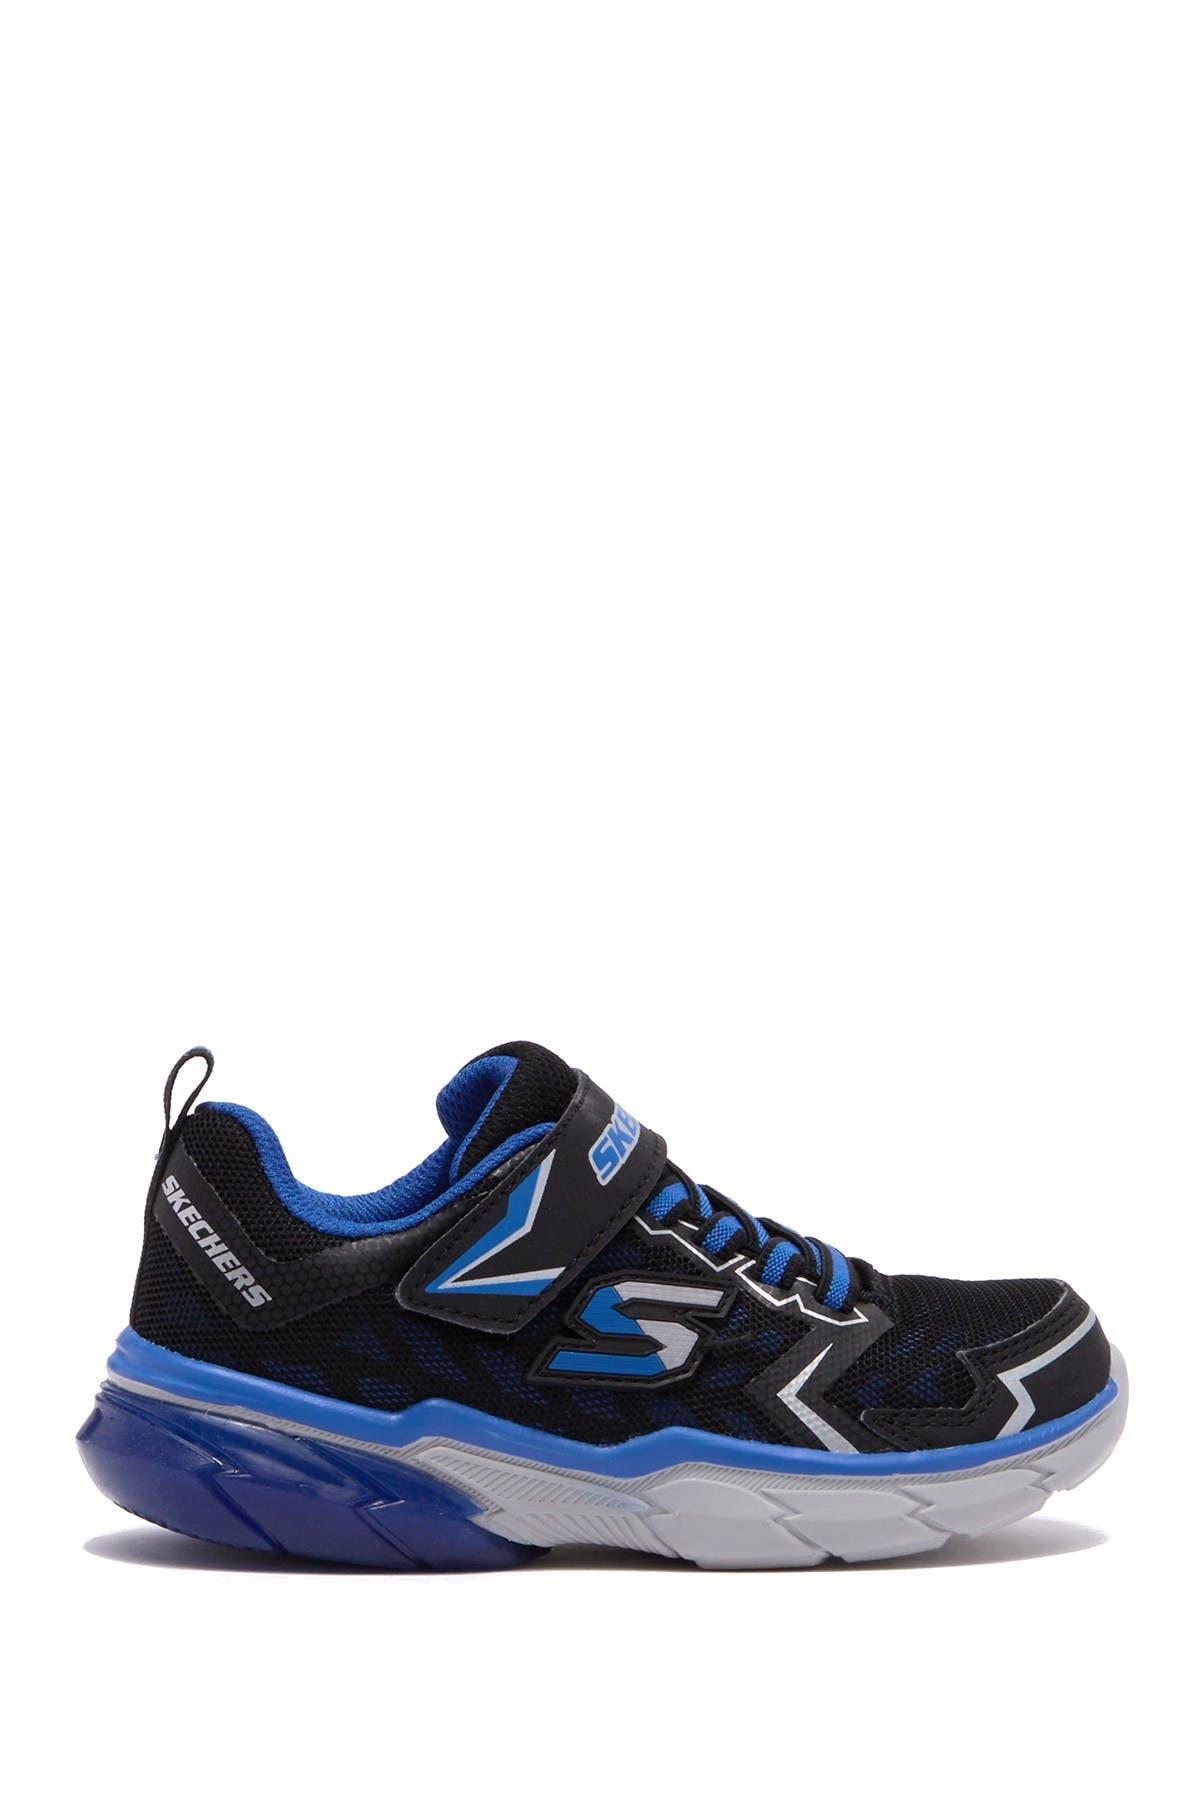 Skechers | Thermoflux Nano Grid Sneaker